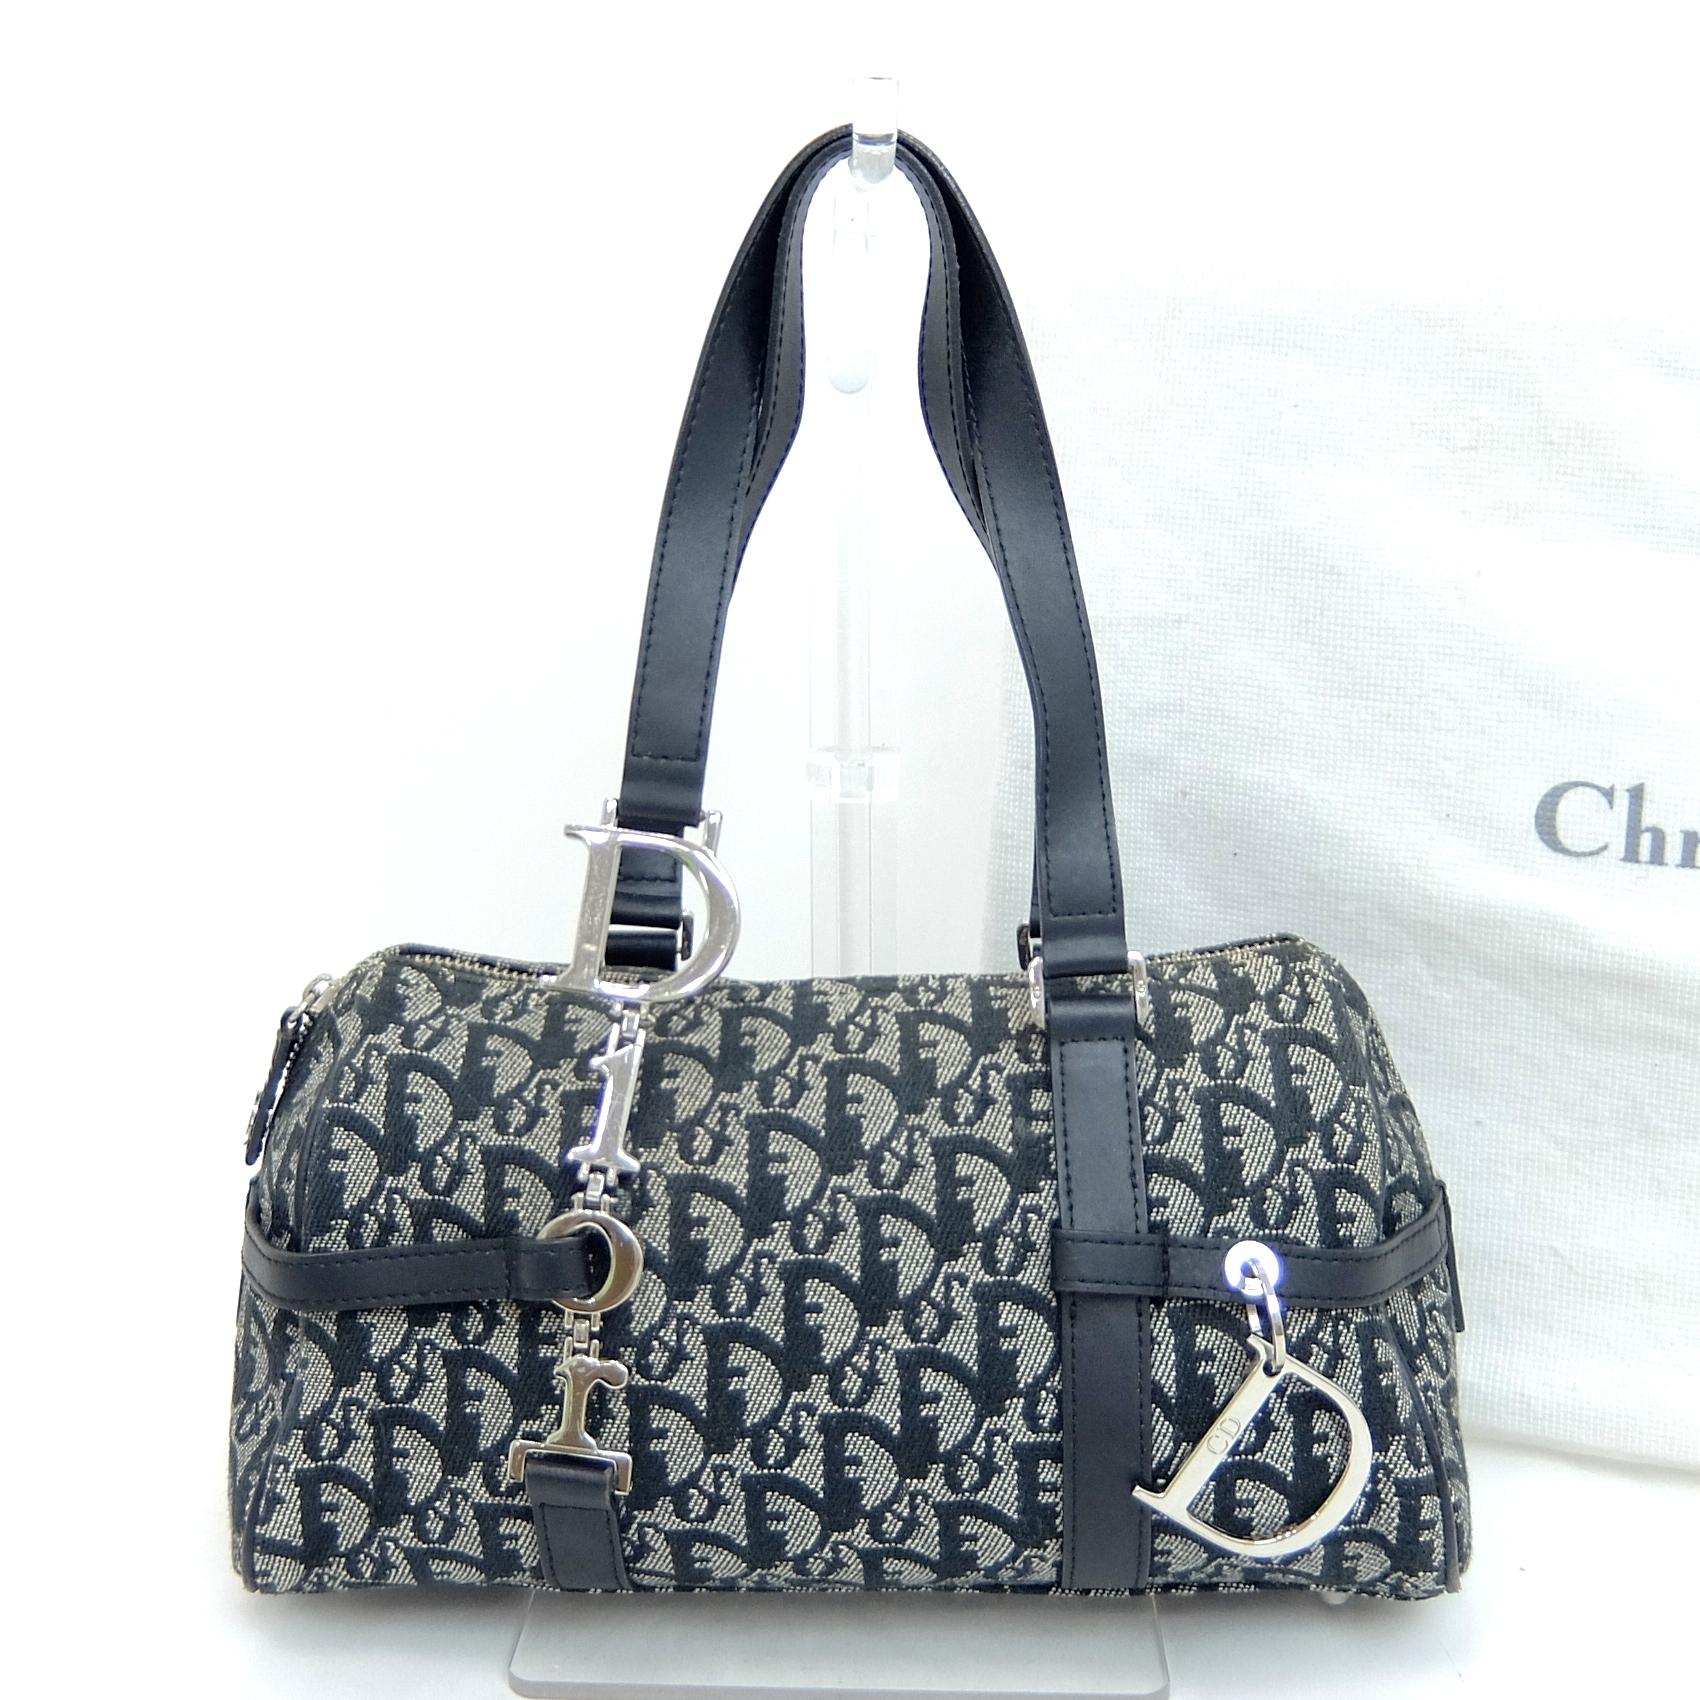 f1f757c85f0 Auth Christian Dior Trotter Women's Canvas,Leather Boston Bag,Handbag Navy